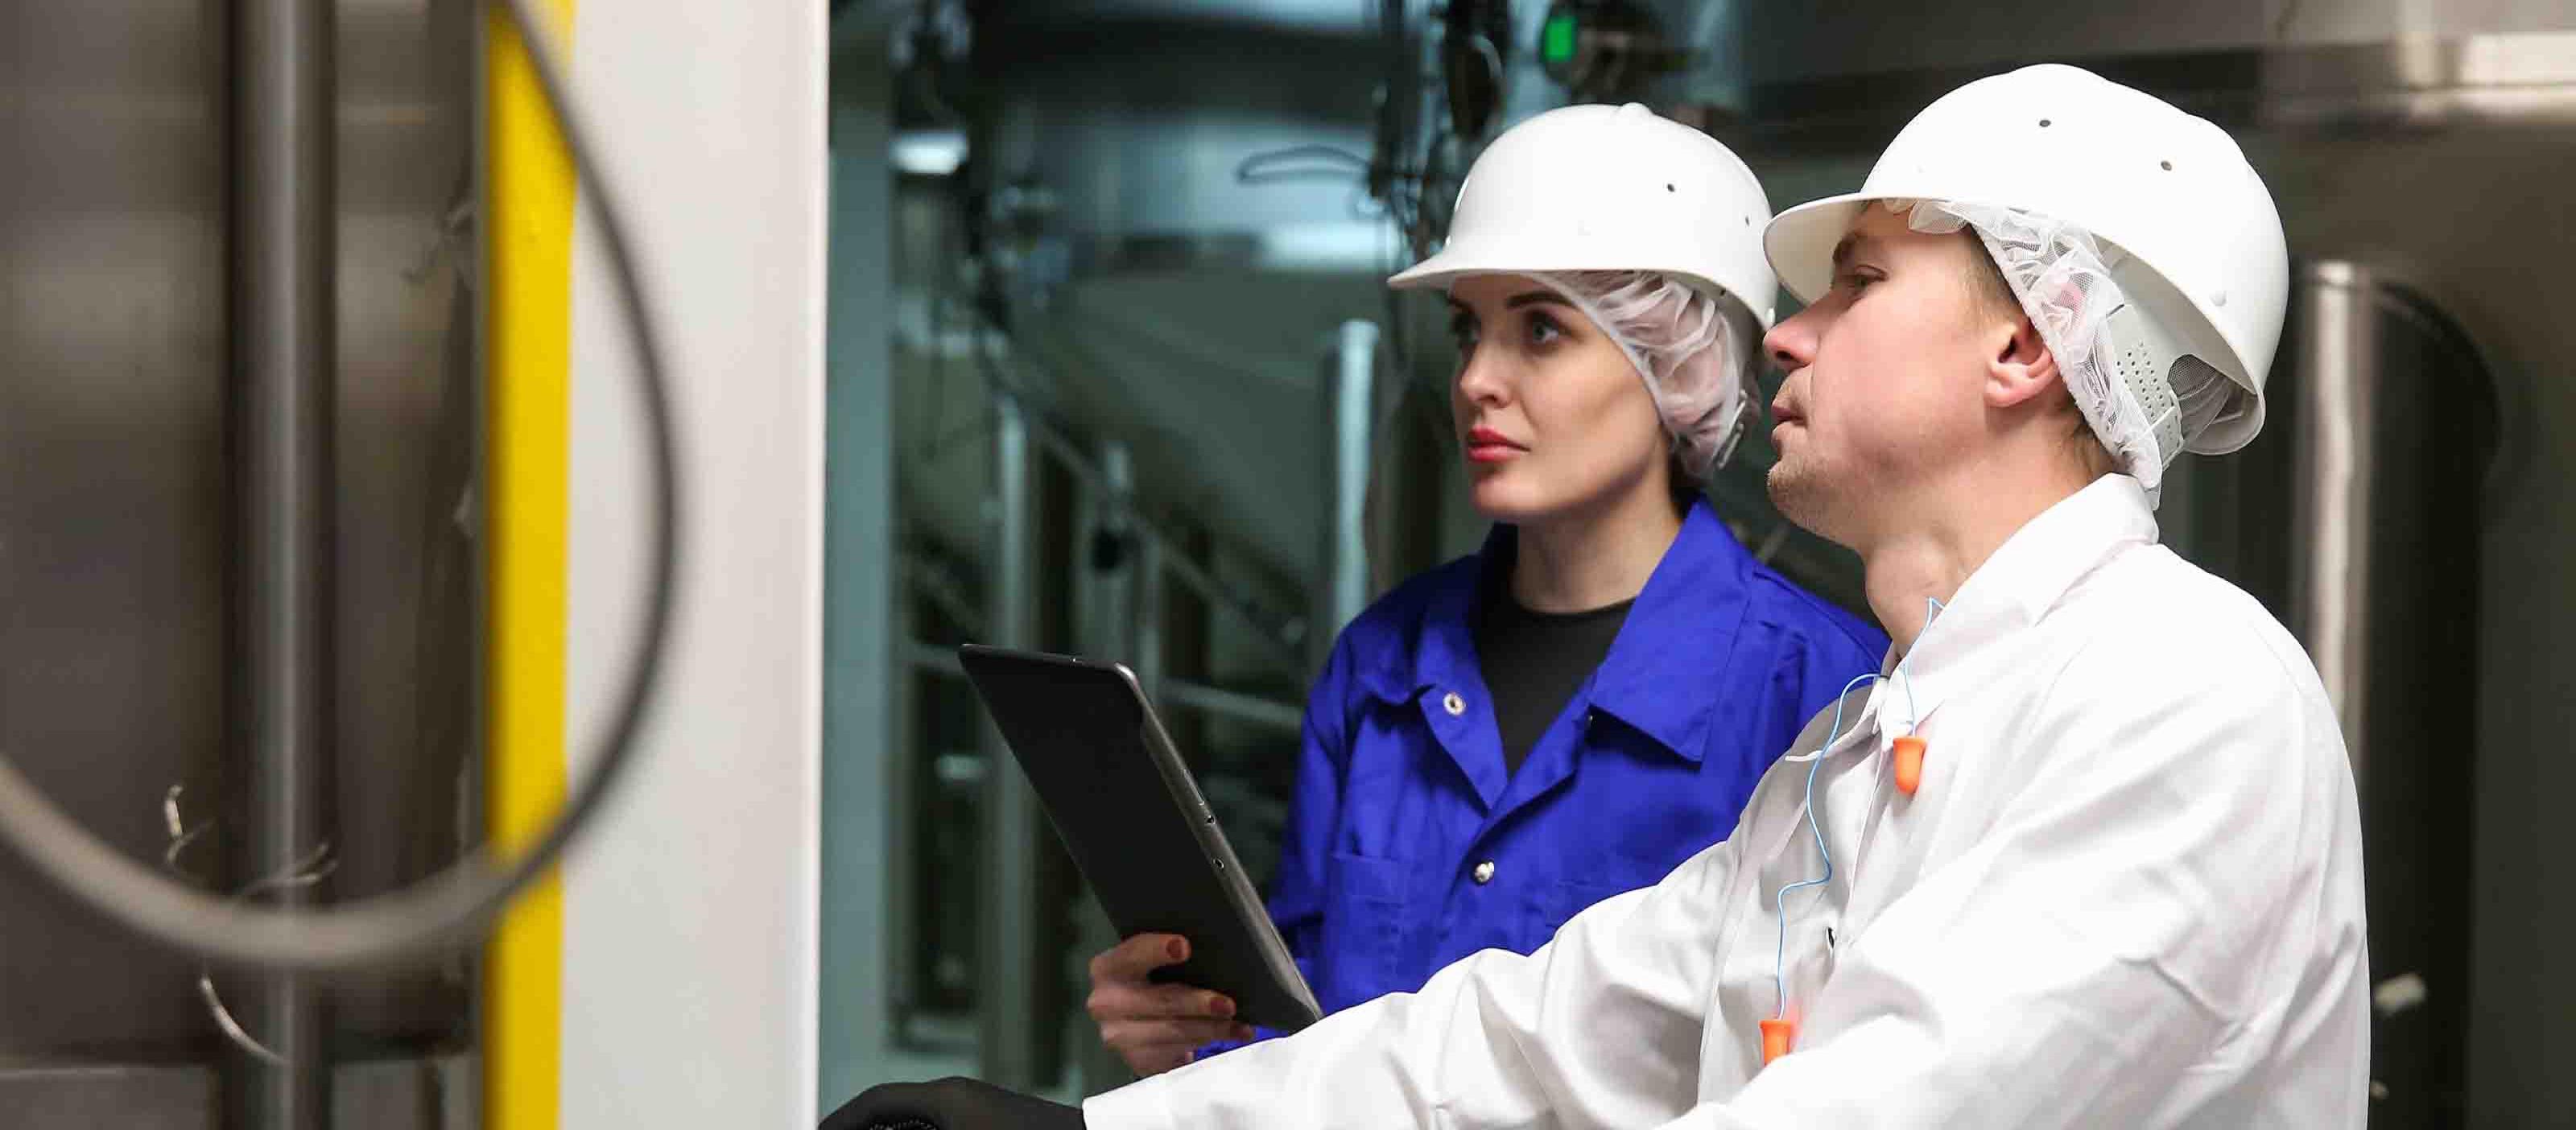 iFIX HMI/SCADA software for manufacturing operational improvement